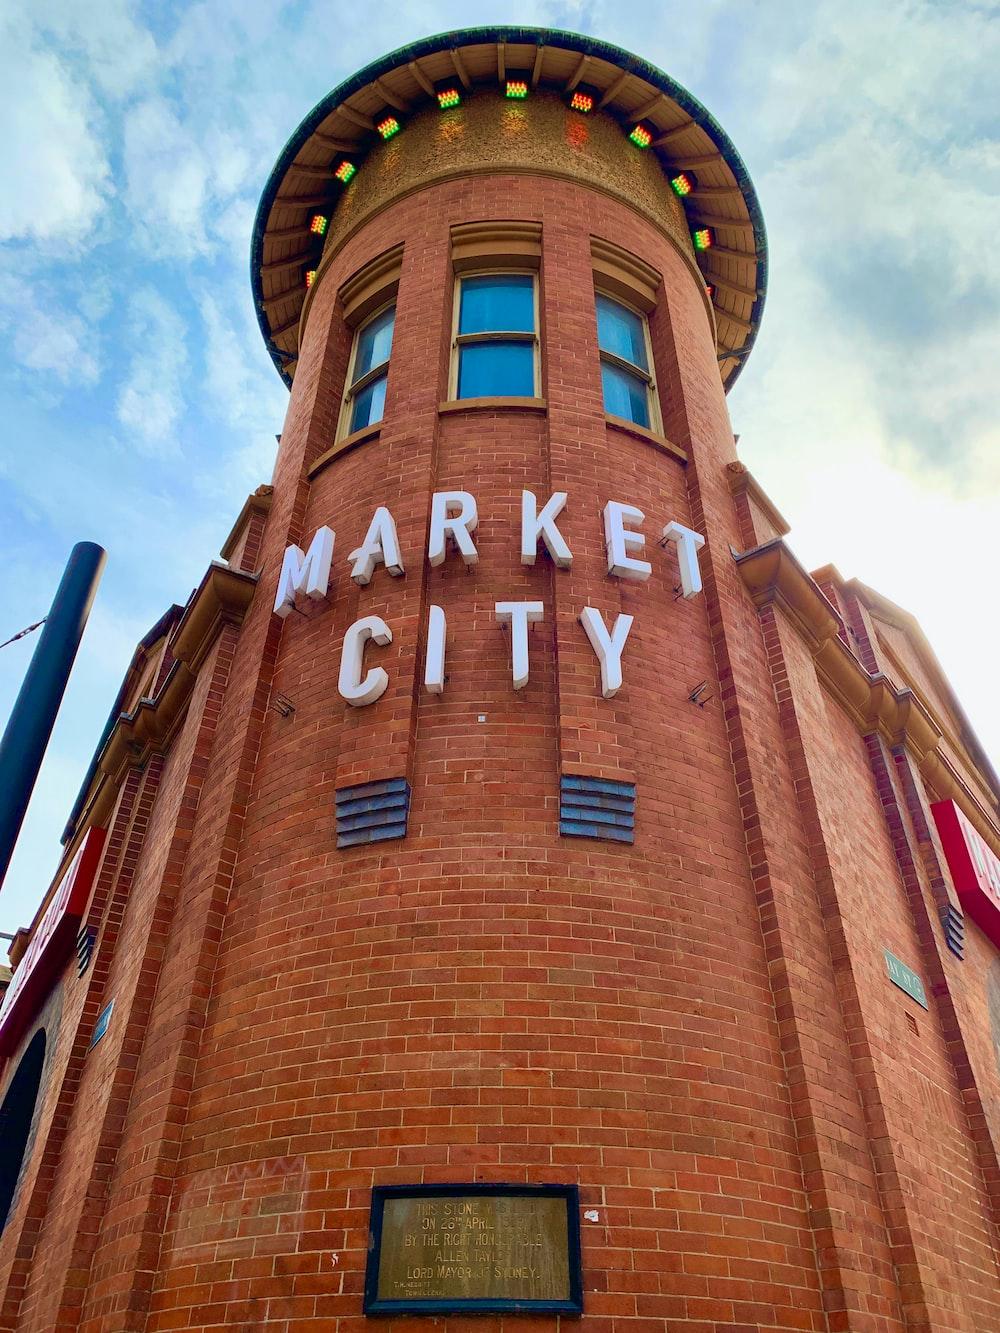 Market City sign